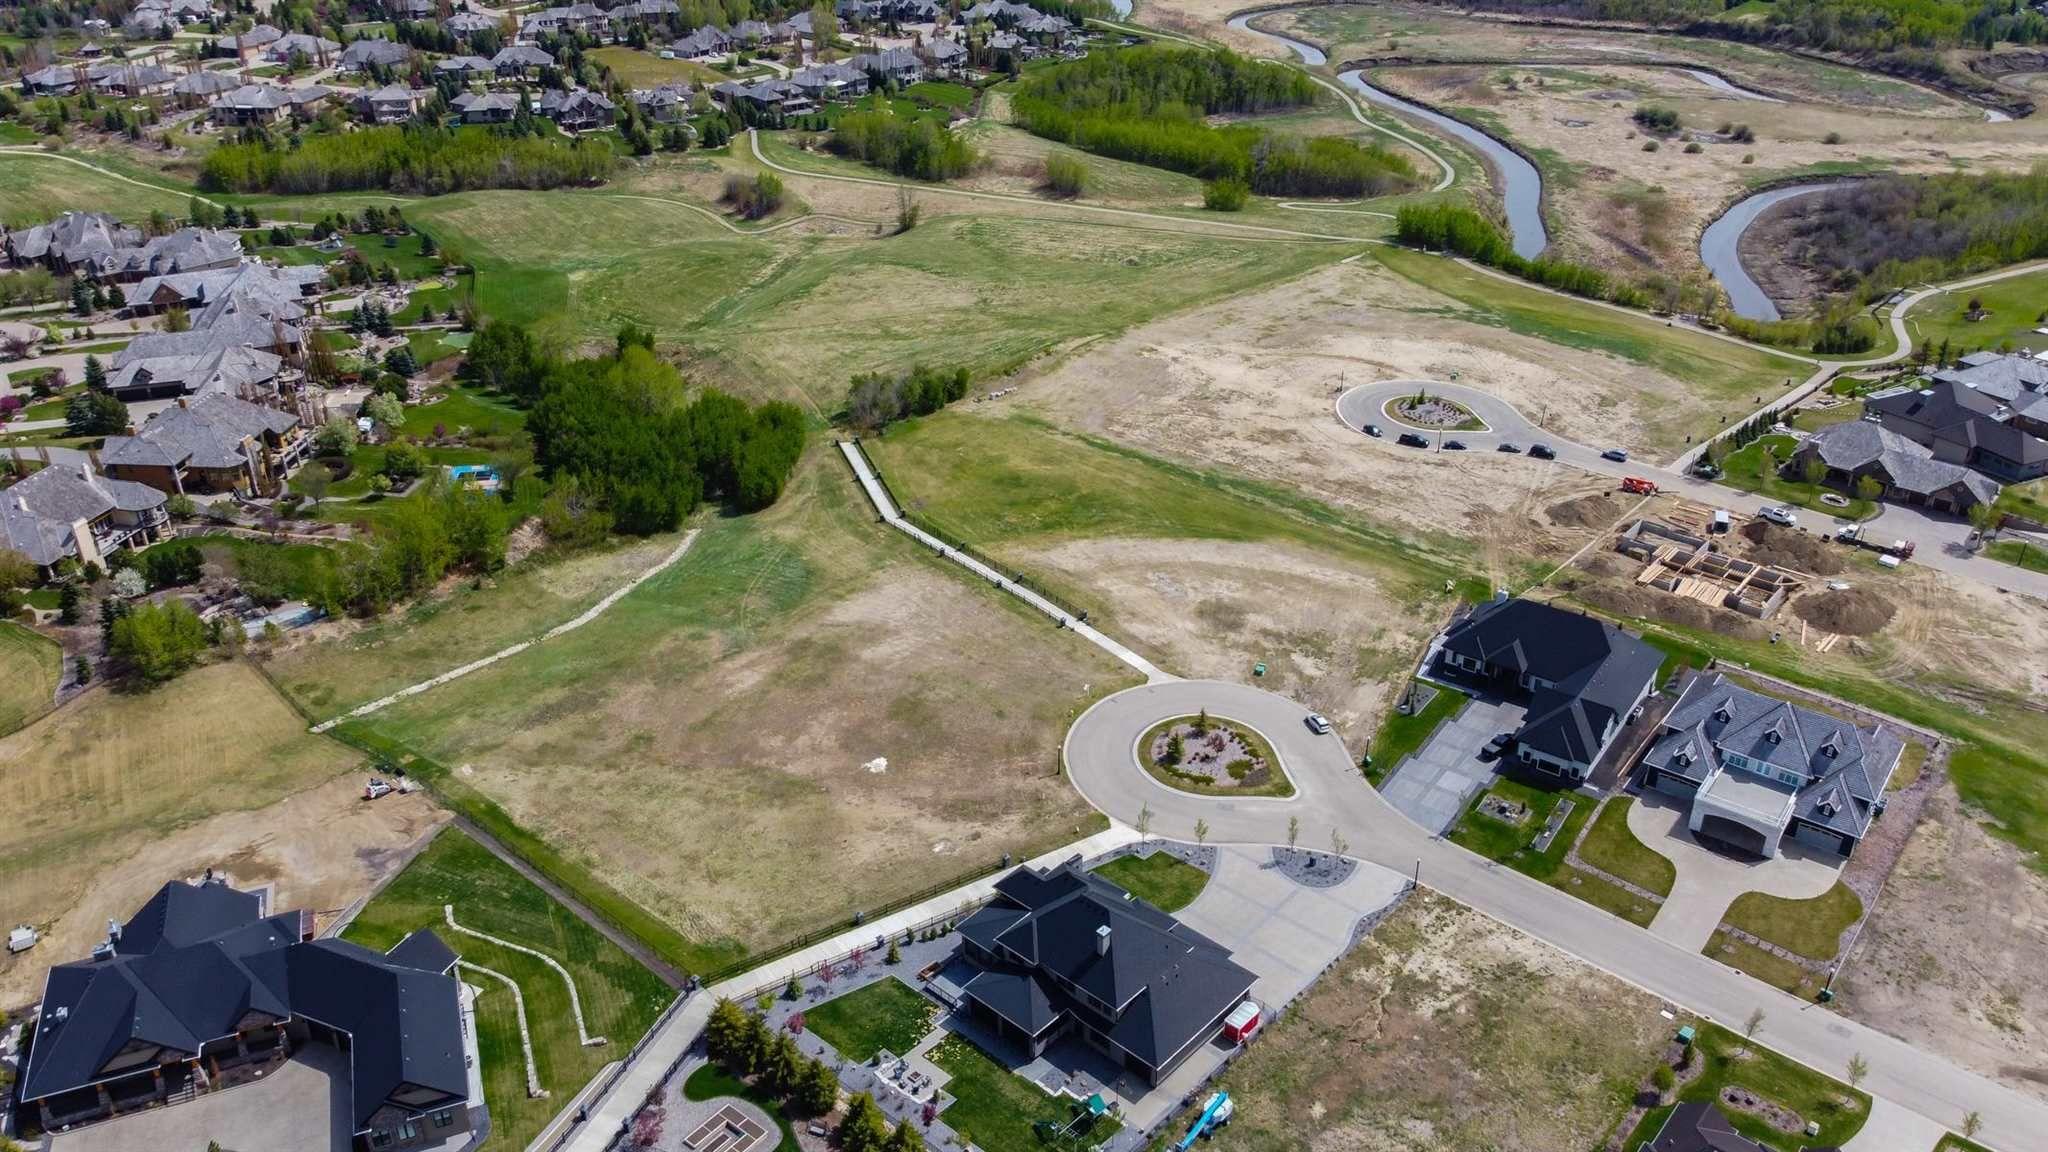 Main Photo: 96 PINNACLE Crest: Rural Sturgeon County Rural Land/Vacant Lot for sale : MLS®# E4246002